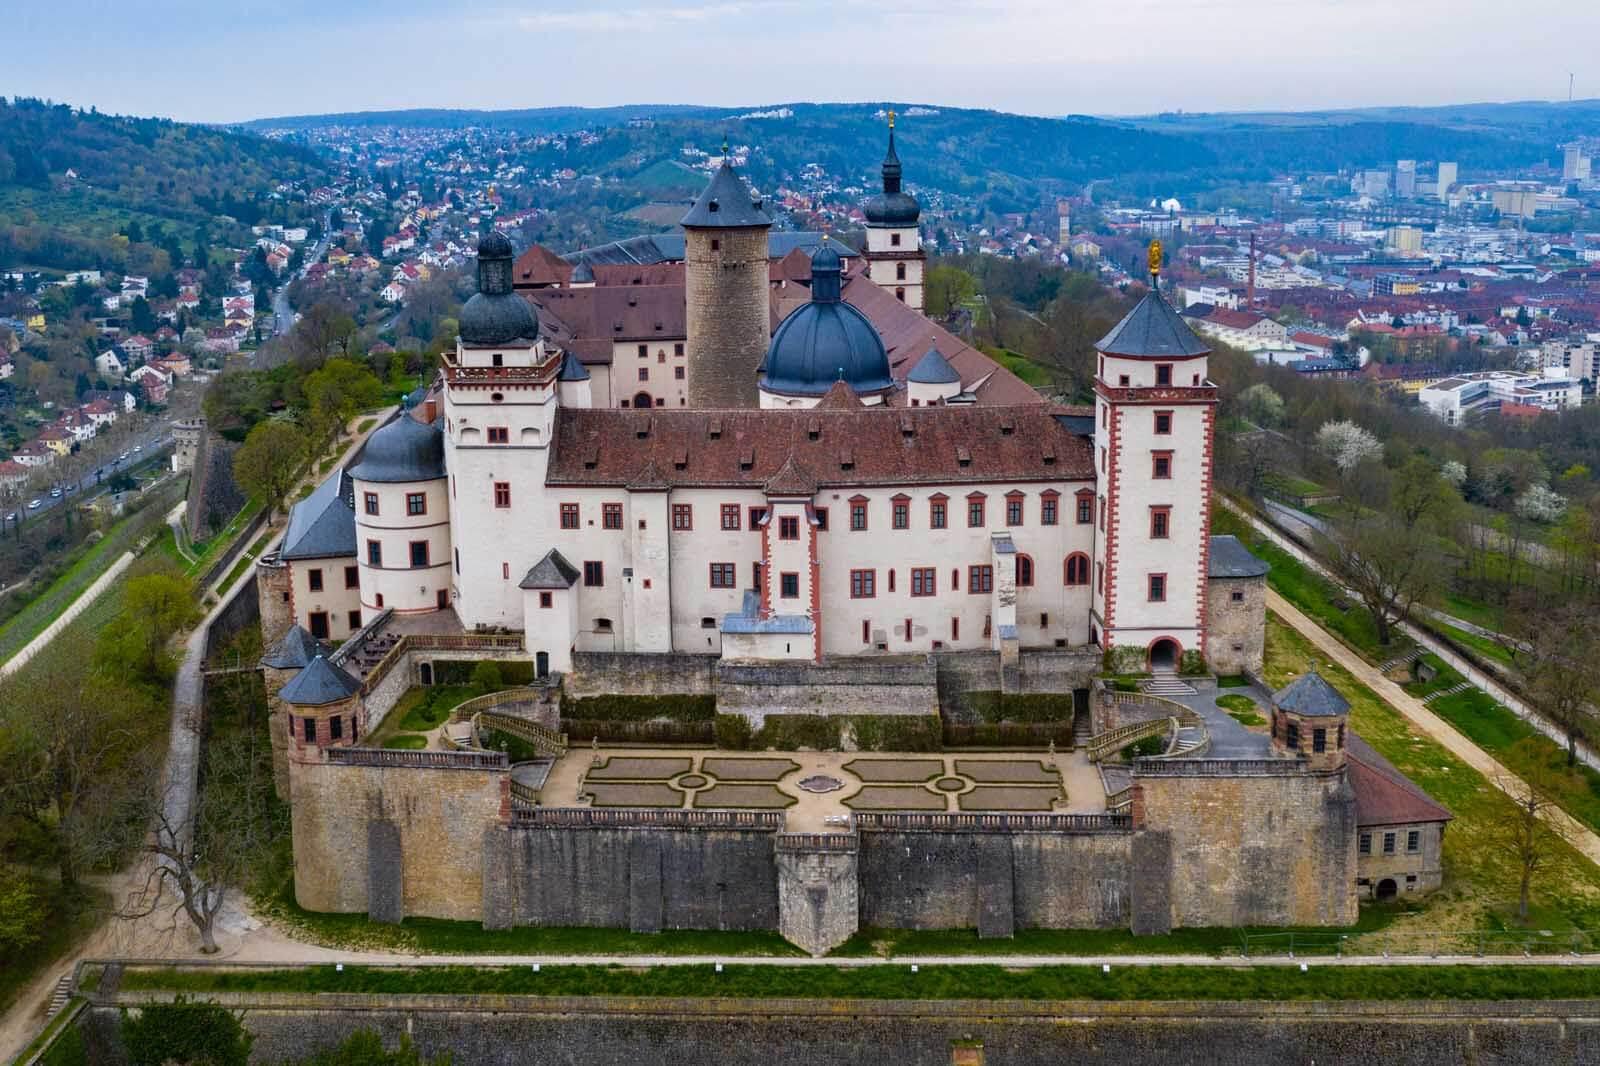 Fortress Marienberg in Würzburg Germany